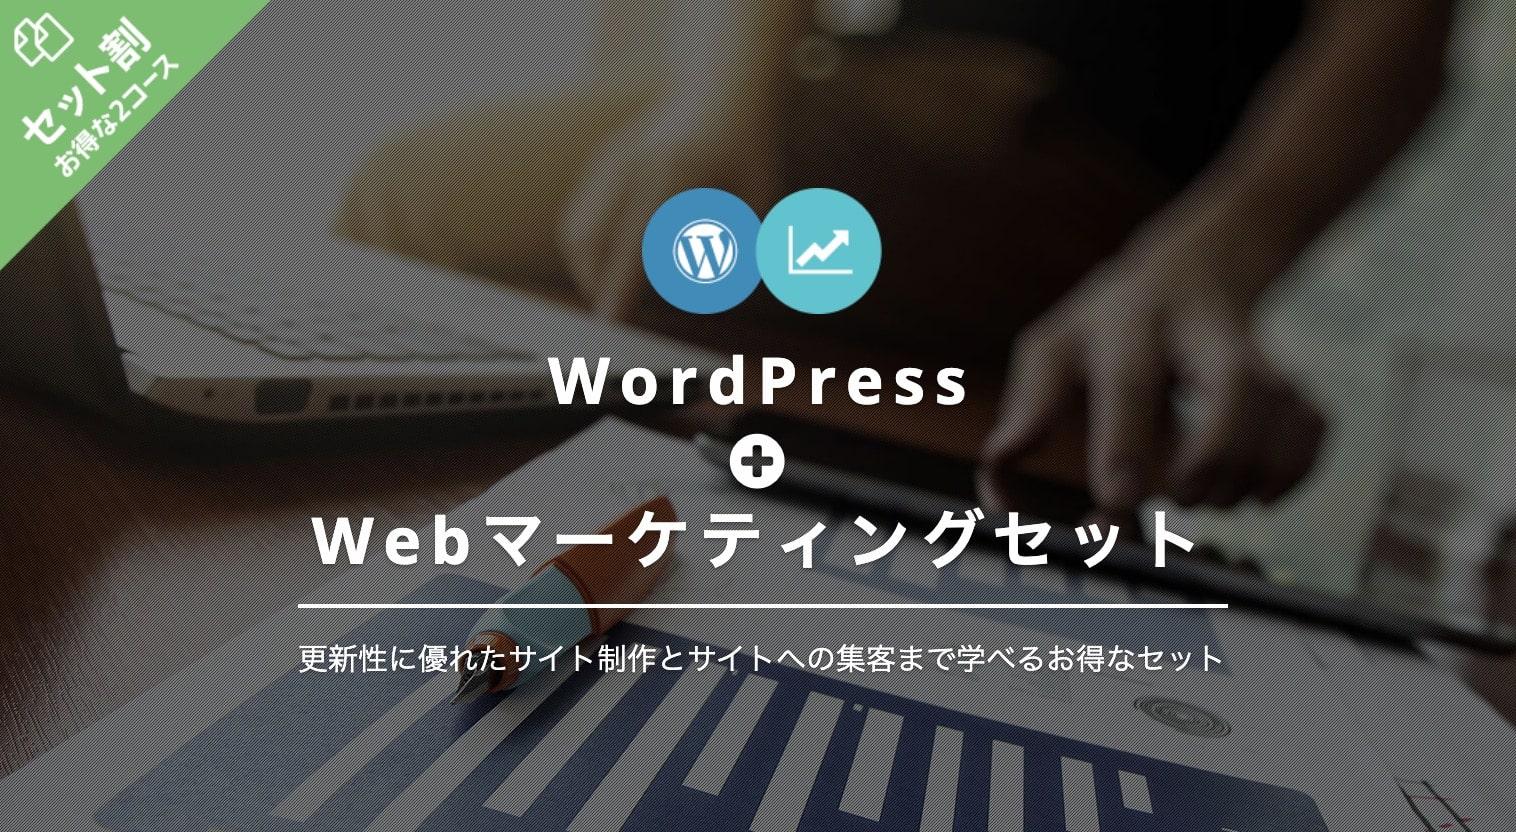 Wordpress+Webマーケティングセットの料金|TechAcademy(テックアカデミー)2セット